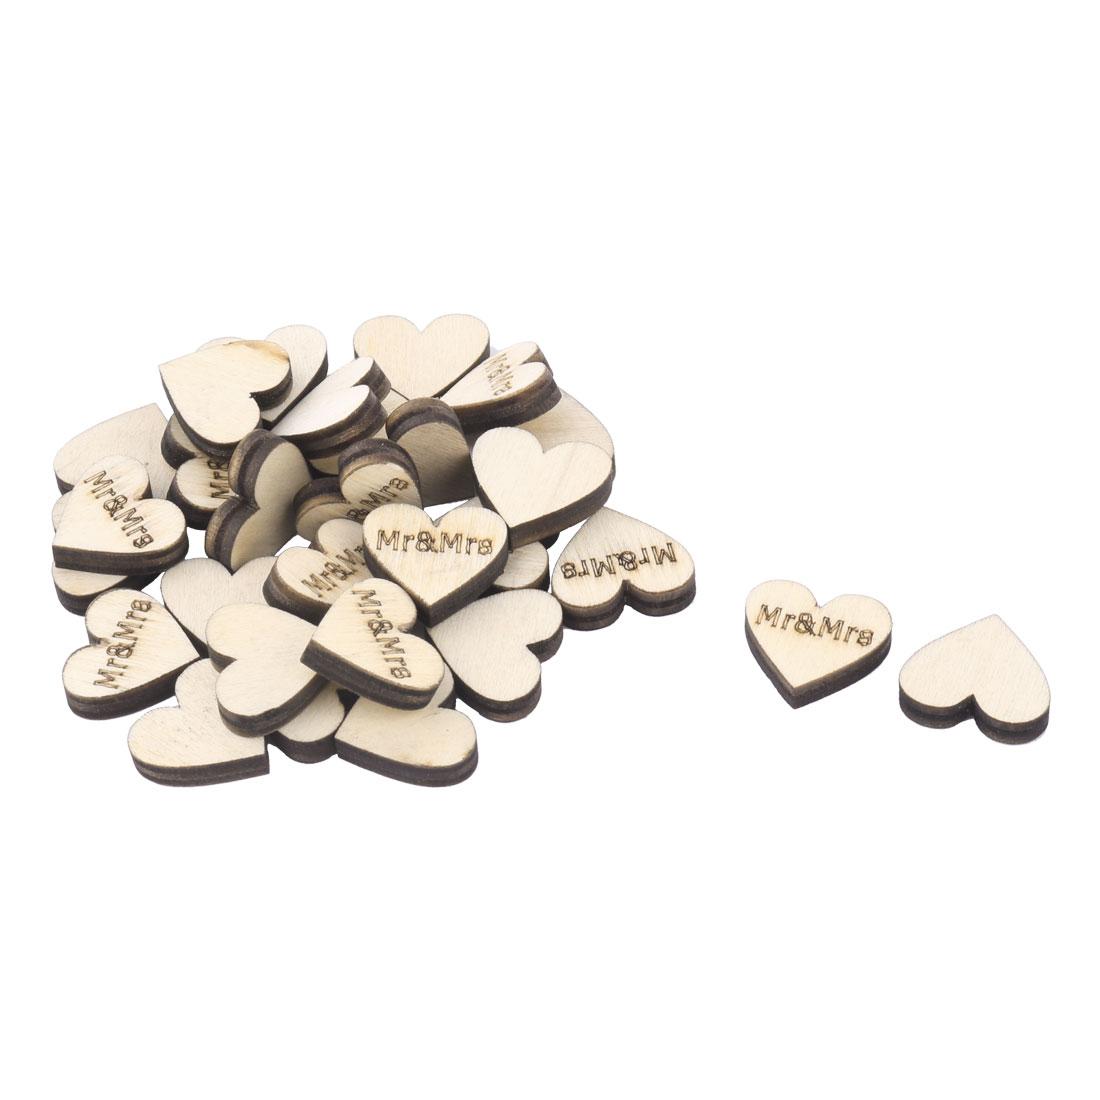 Wooden Heart Shape DIY Crafts Wedding Table Decor Accessories Embellishment 30 Pcs